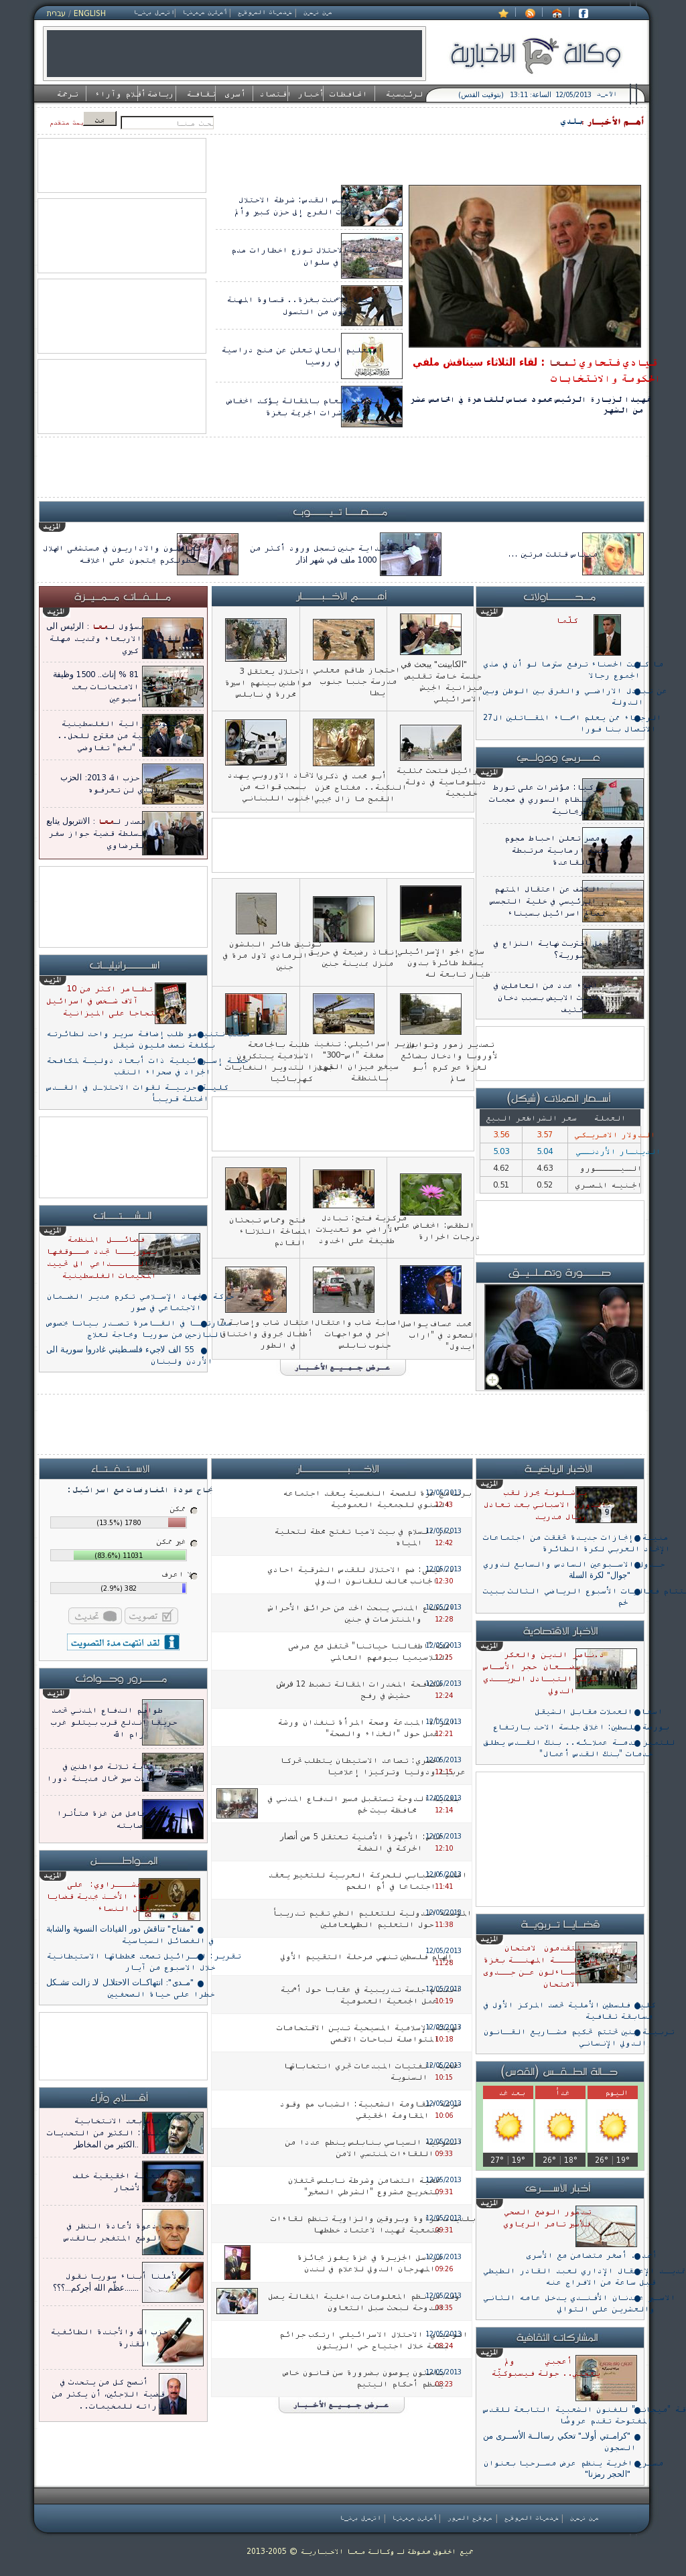 Ma'an News at Sunday May 12, 2013, 10:11 a.m. UTC